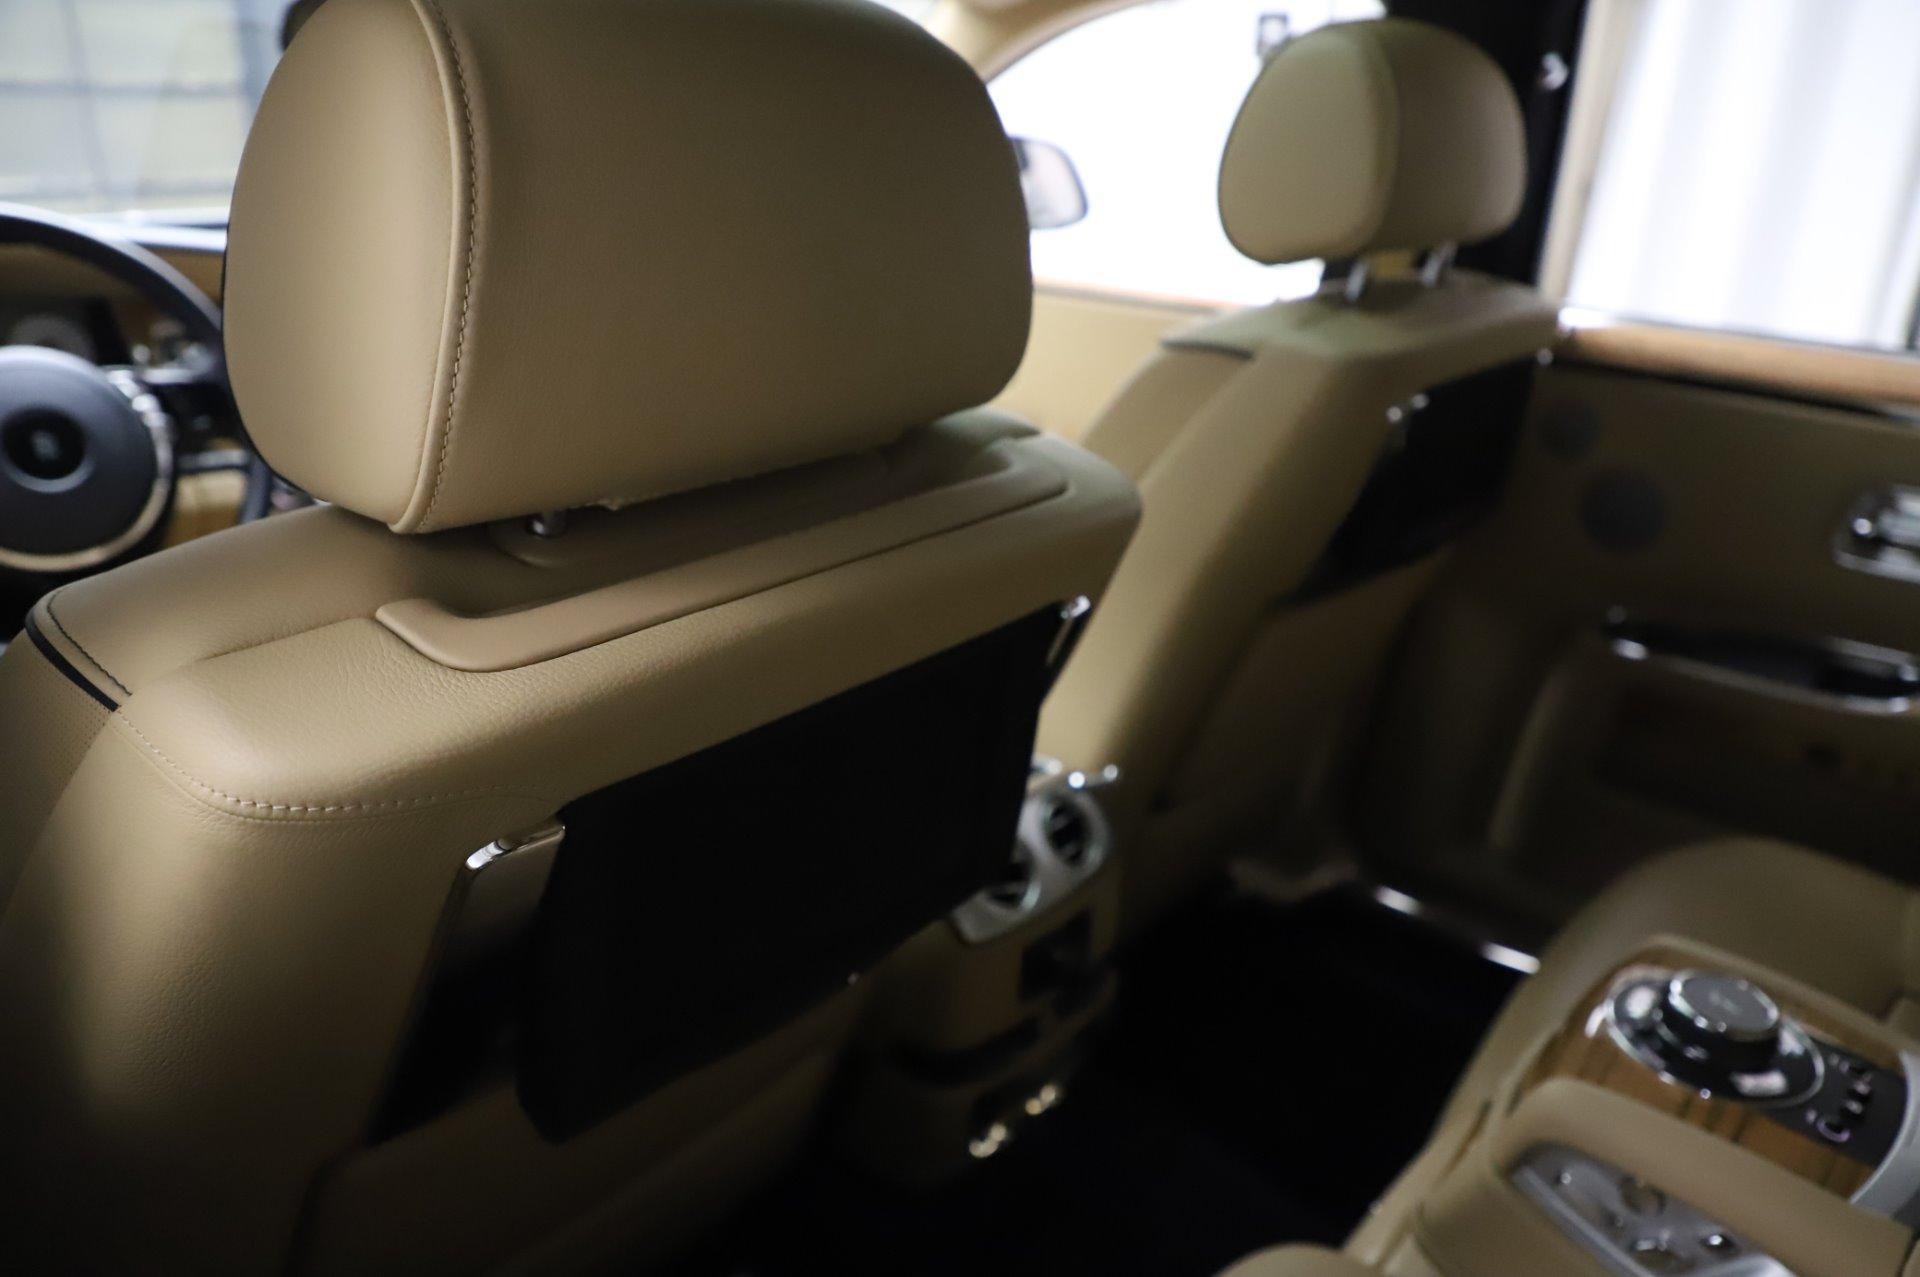 Used 2014 Rolls-Royce Ghost V-Spec For Sale In Westport, CT 858_p15